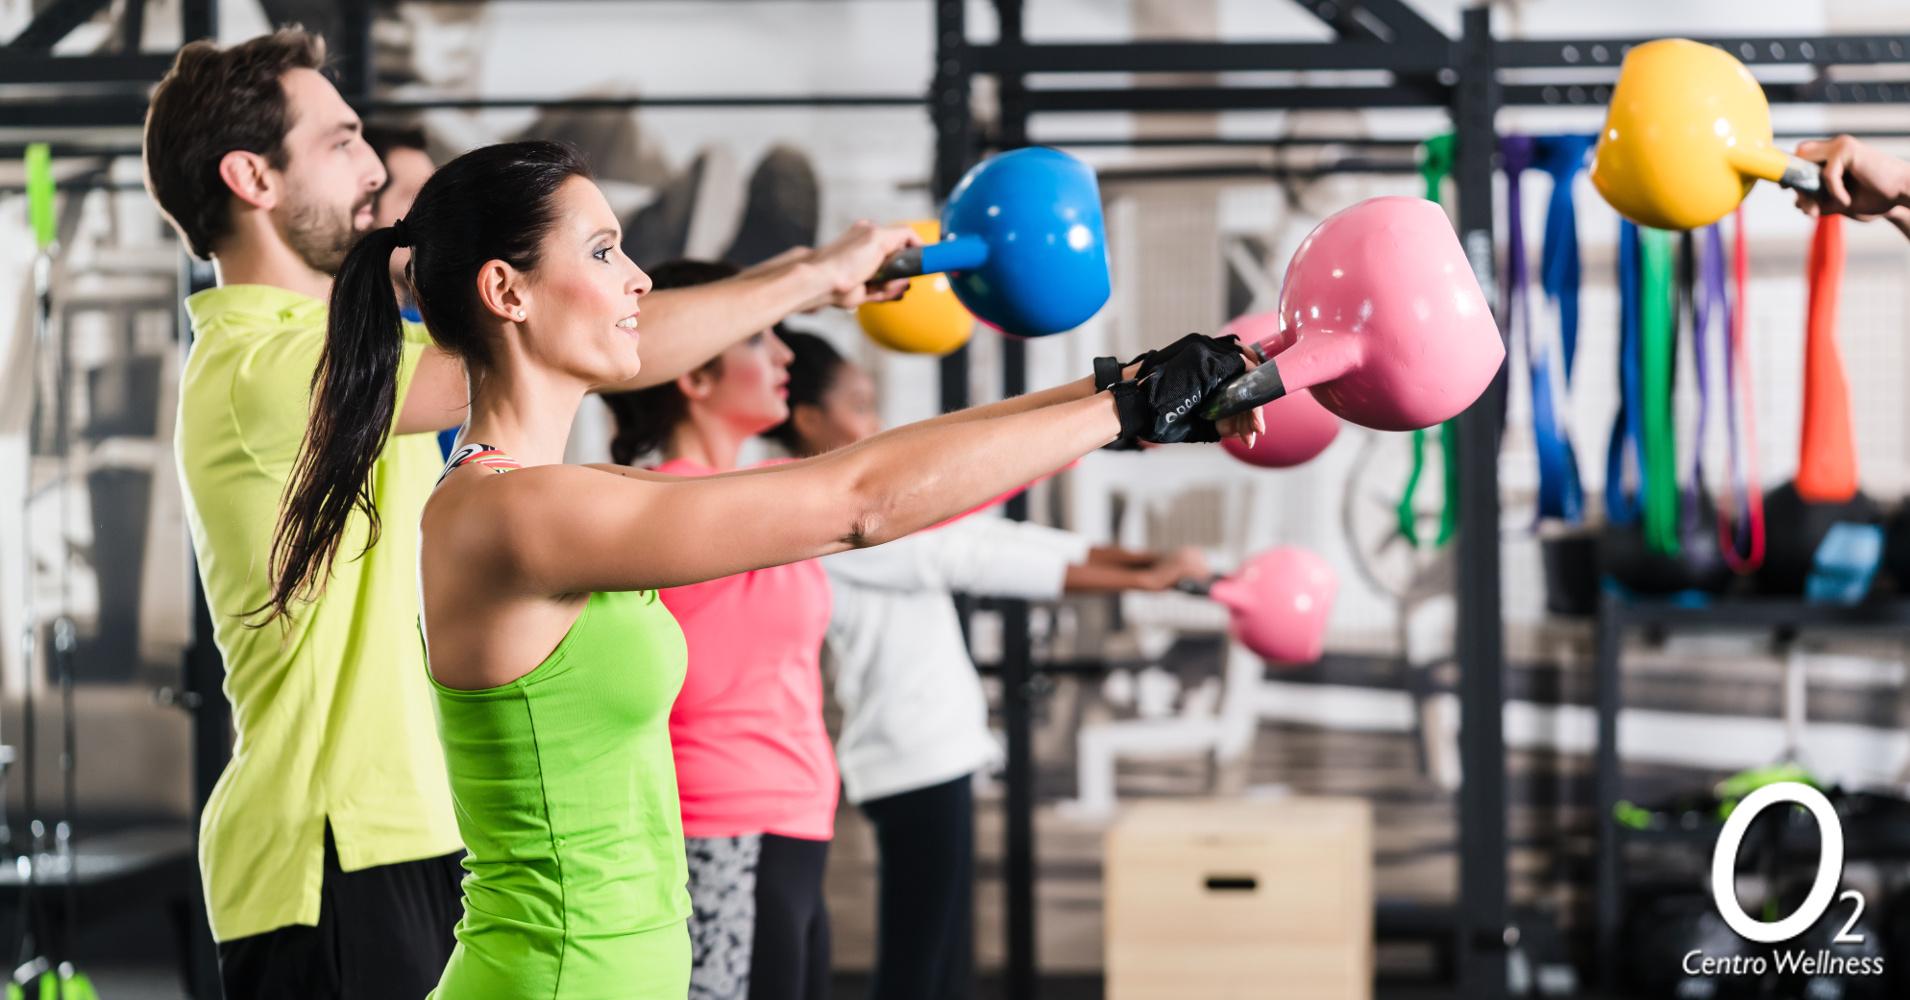 Circuito Gimnasio : Circuito alta intensidad gimnasio fitness o centro wellness